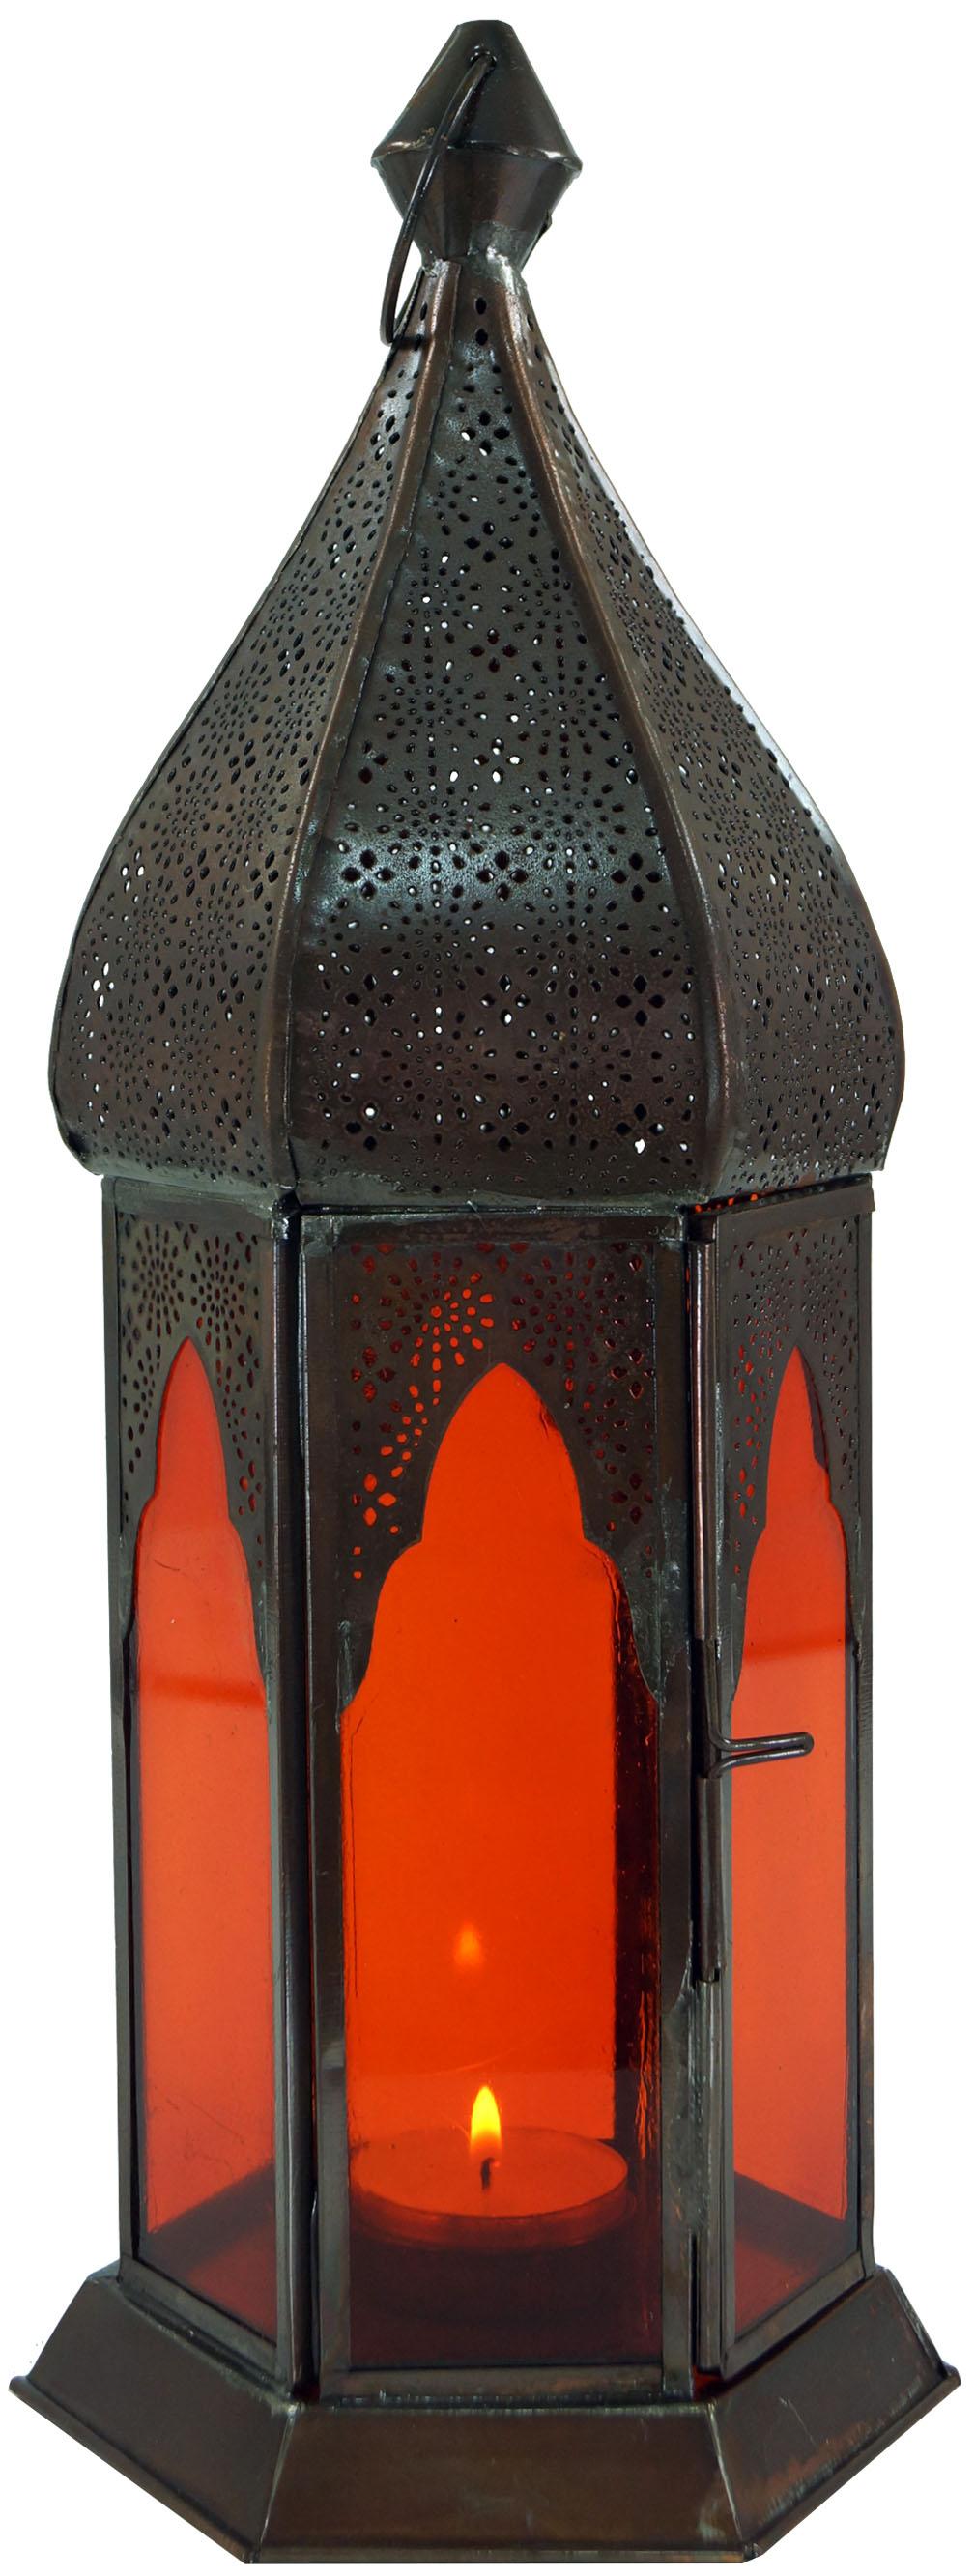 orientalische metall glas laterne in marrokanischem design. Black Bedroom Furniture Sets. Home Design Ideas